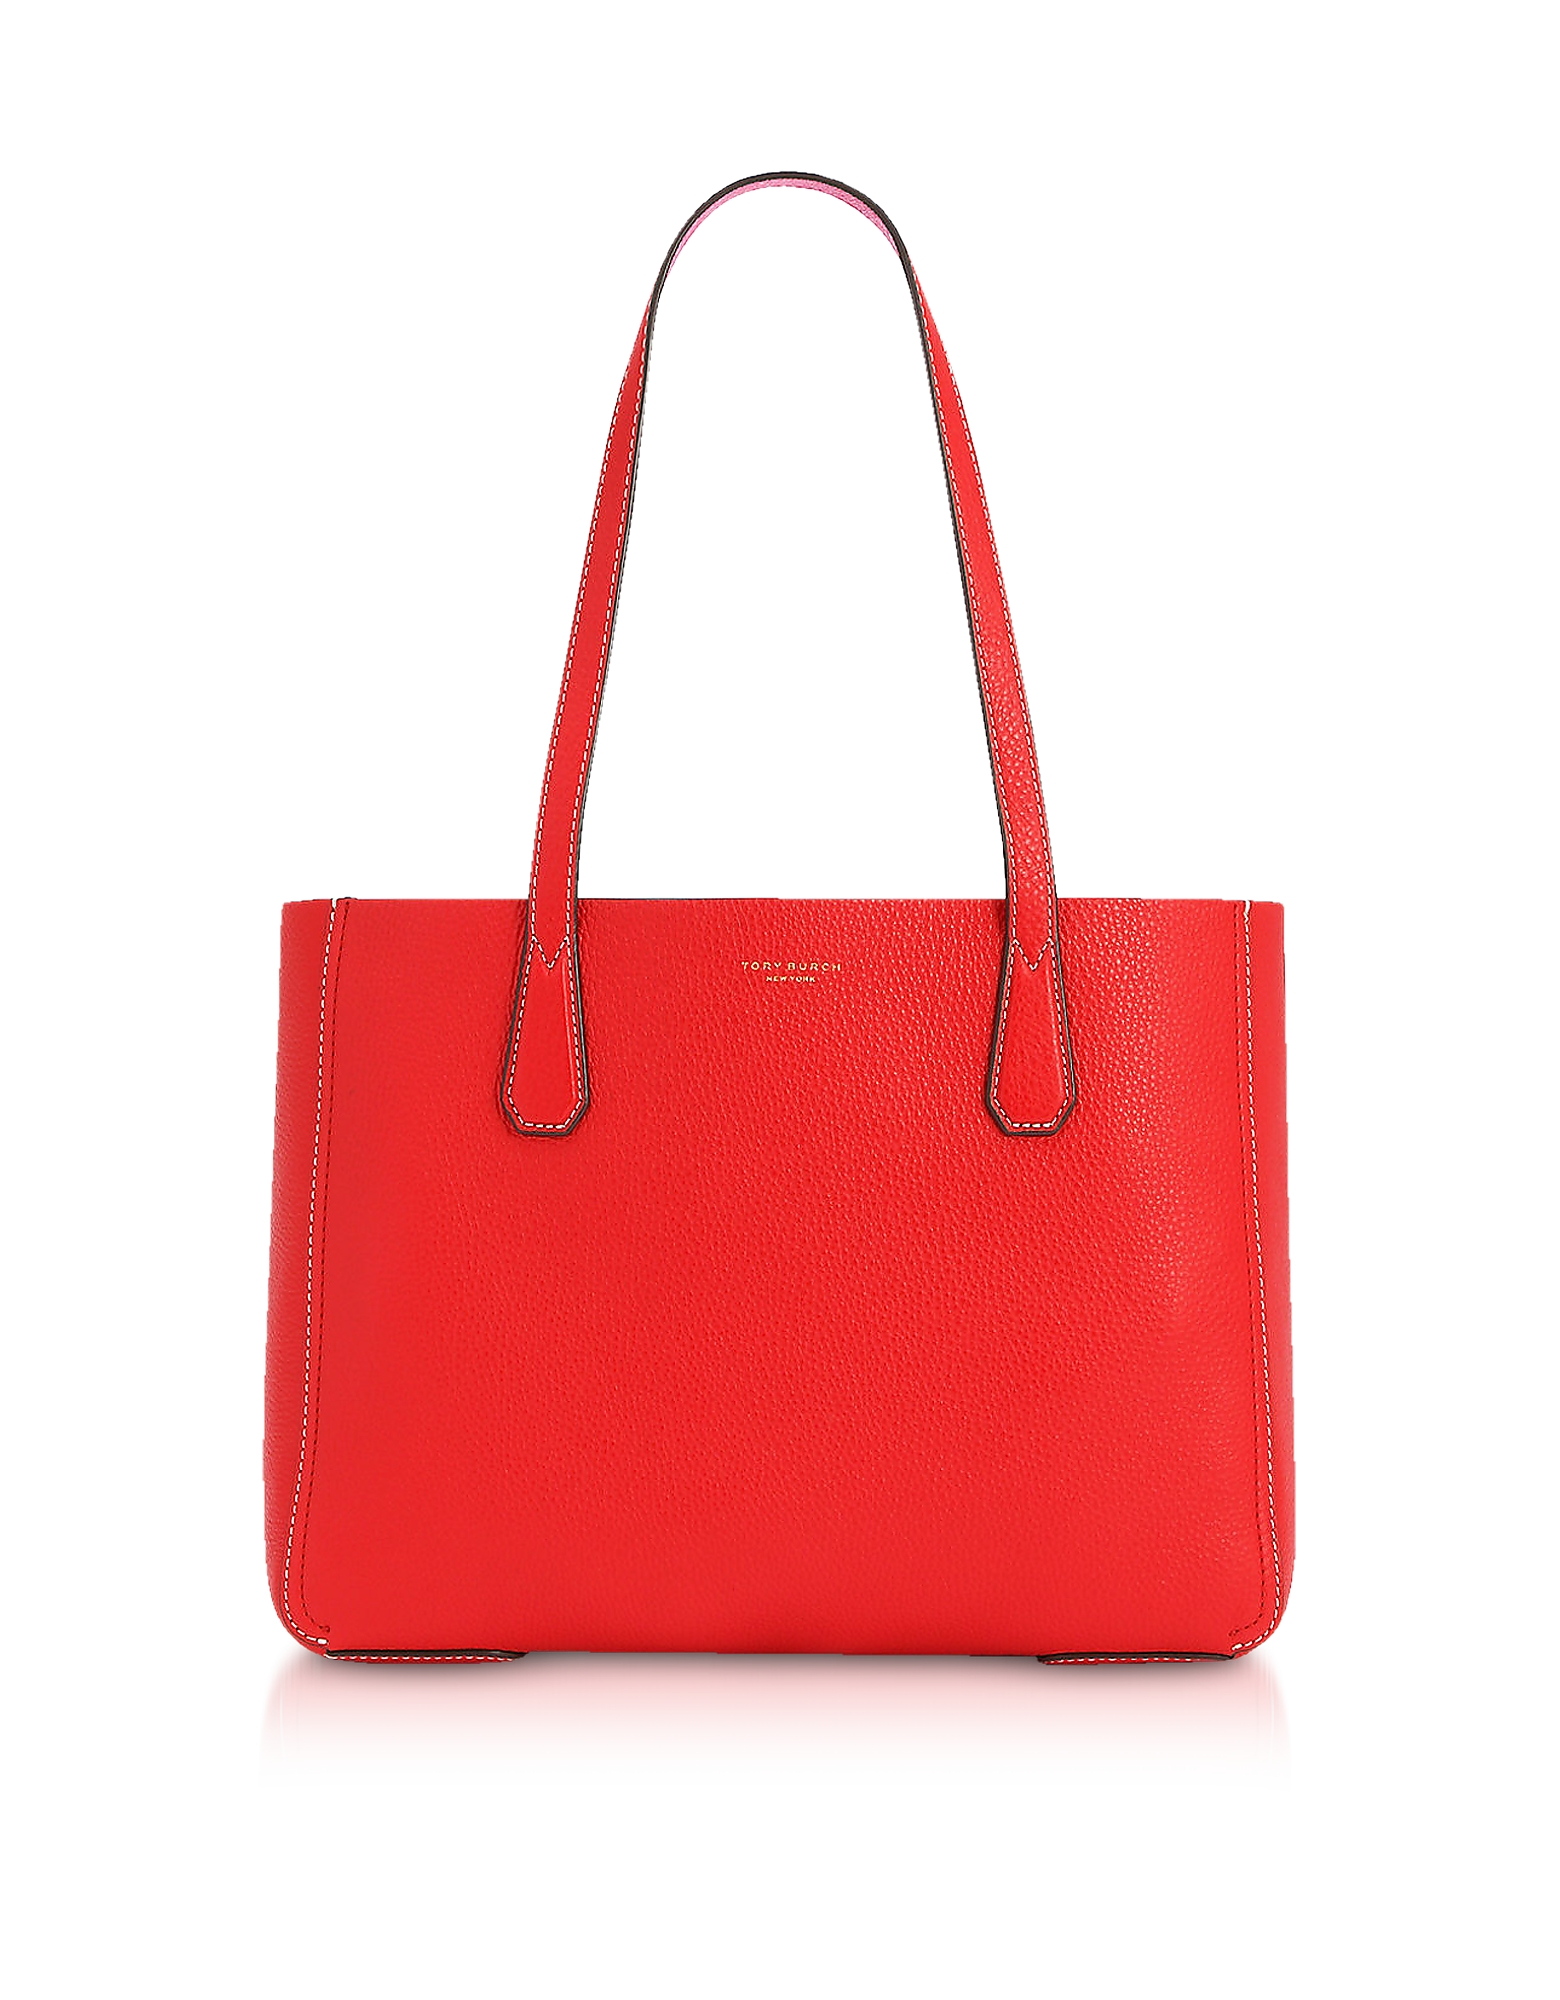 Tory Burch Handbags, Phoebe Pebbled Leather Mini Tote Bag